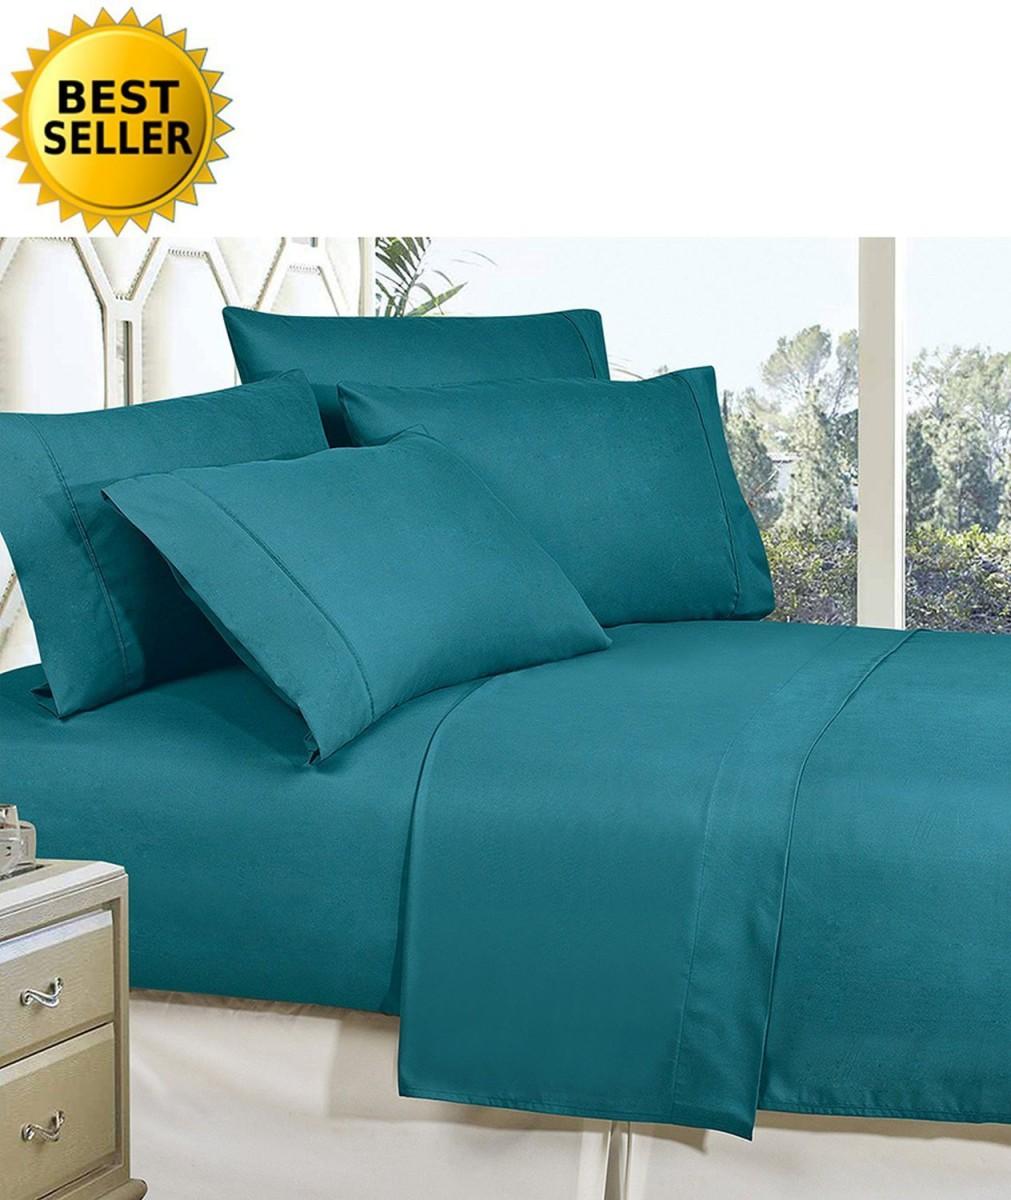 Celine Linen Best, Softest, Coziest Bed Sheets Ever